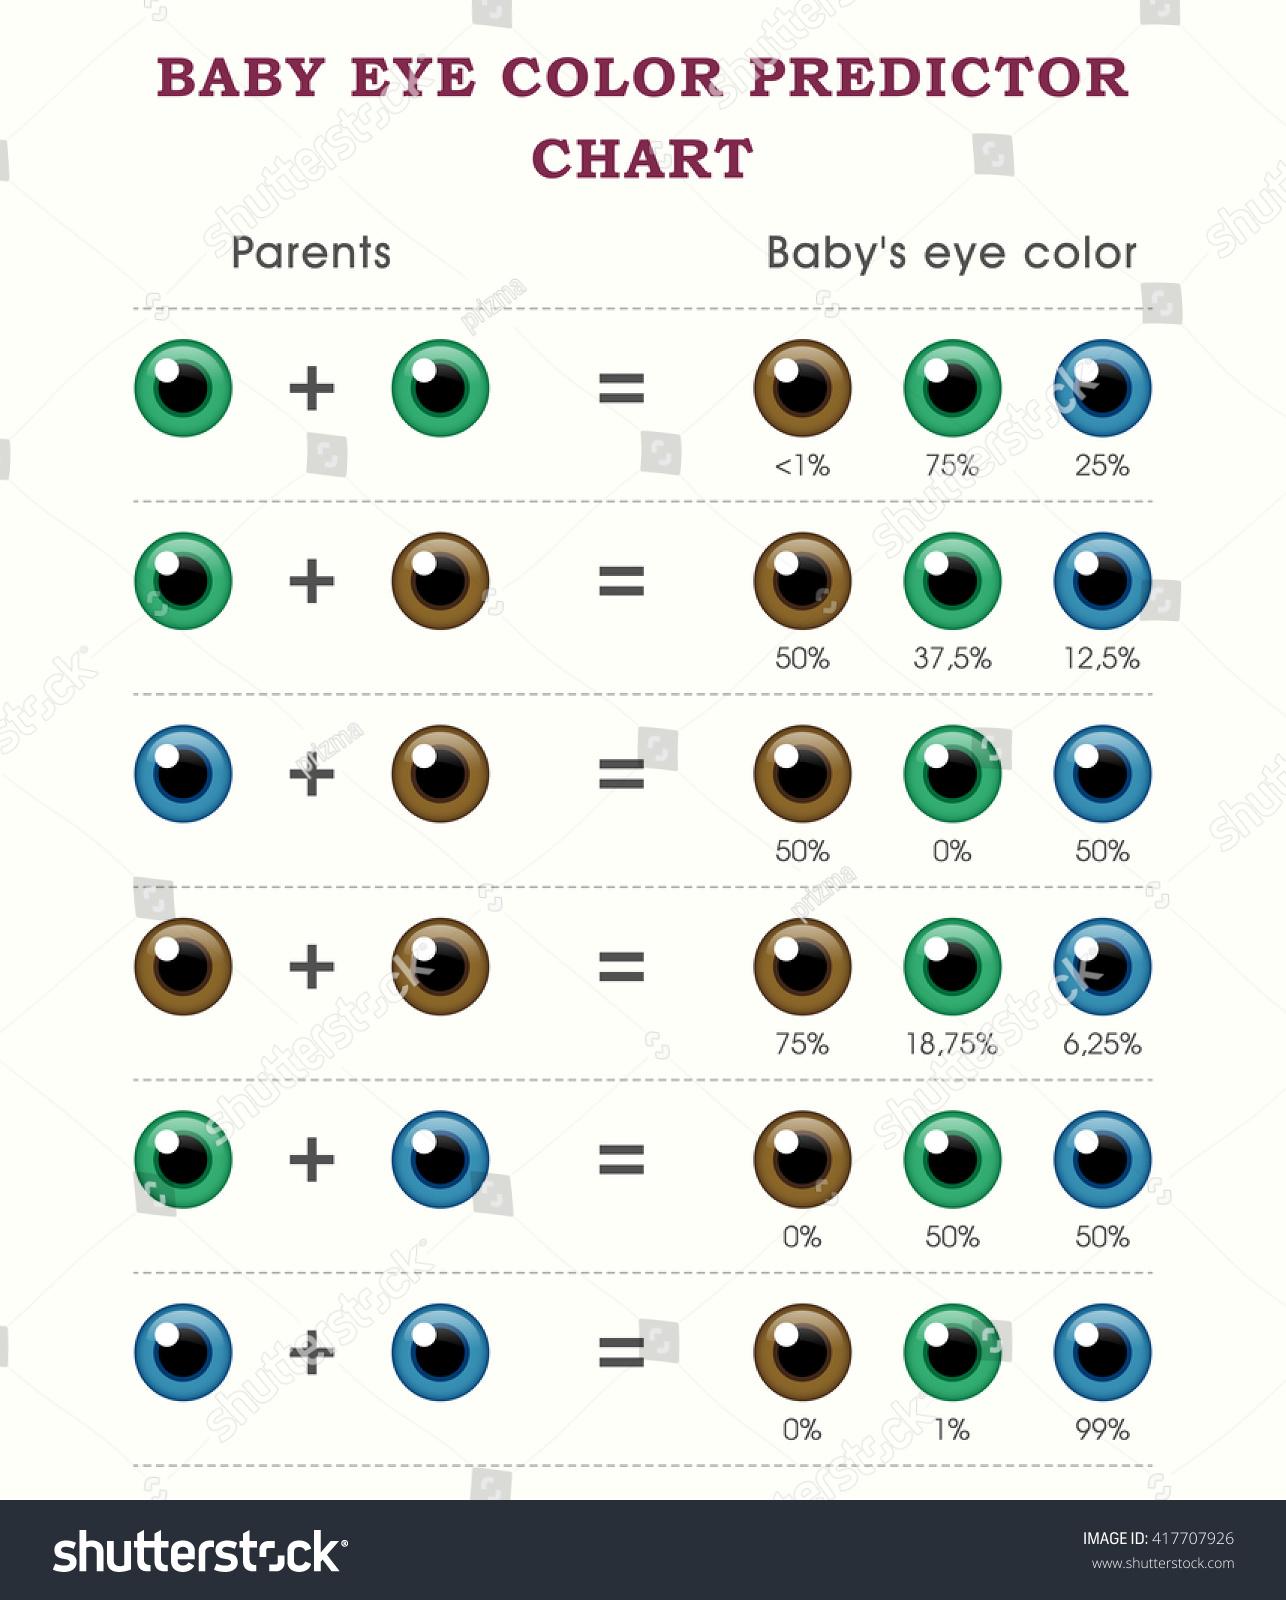 Baby Eye Color Predictor Chart Template Stock Vector